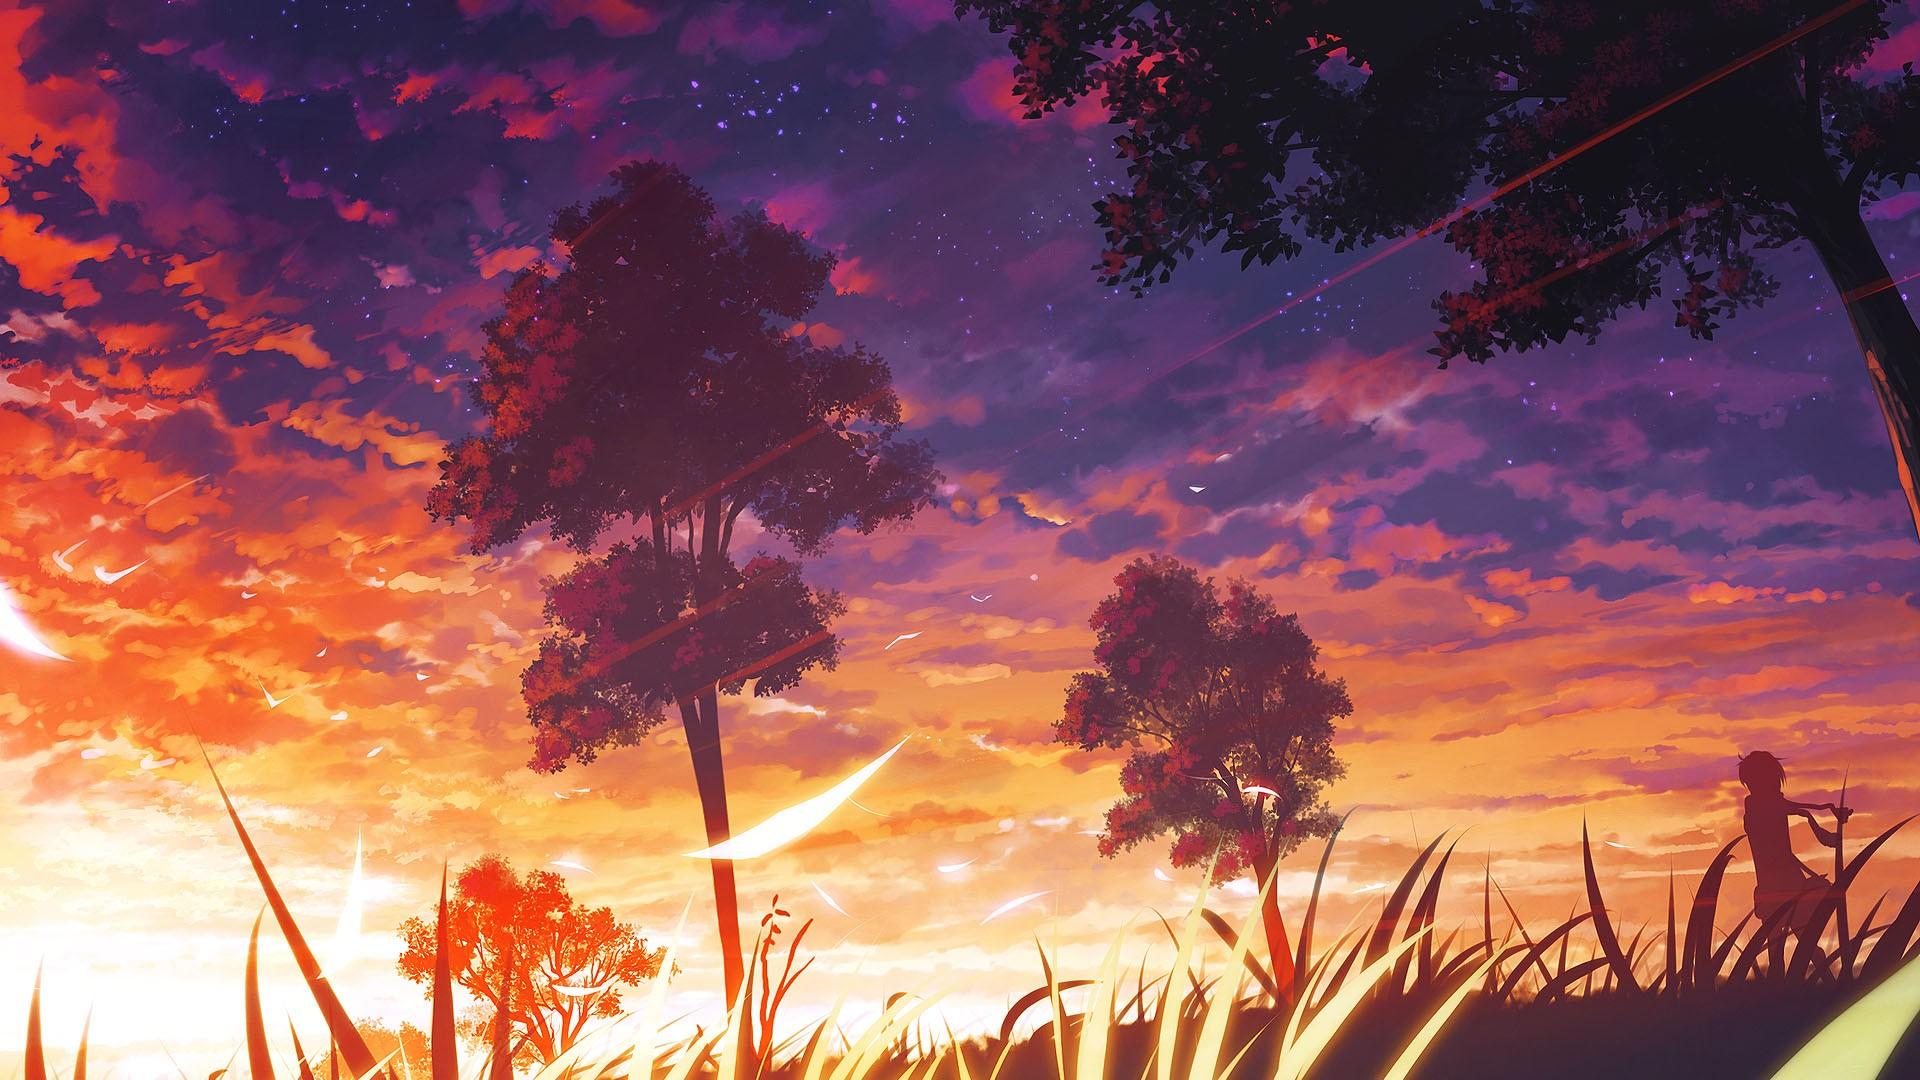 Beautiful Anime Scenery Wallpaper